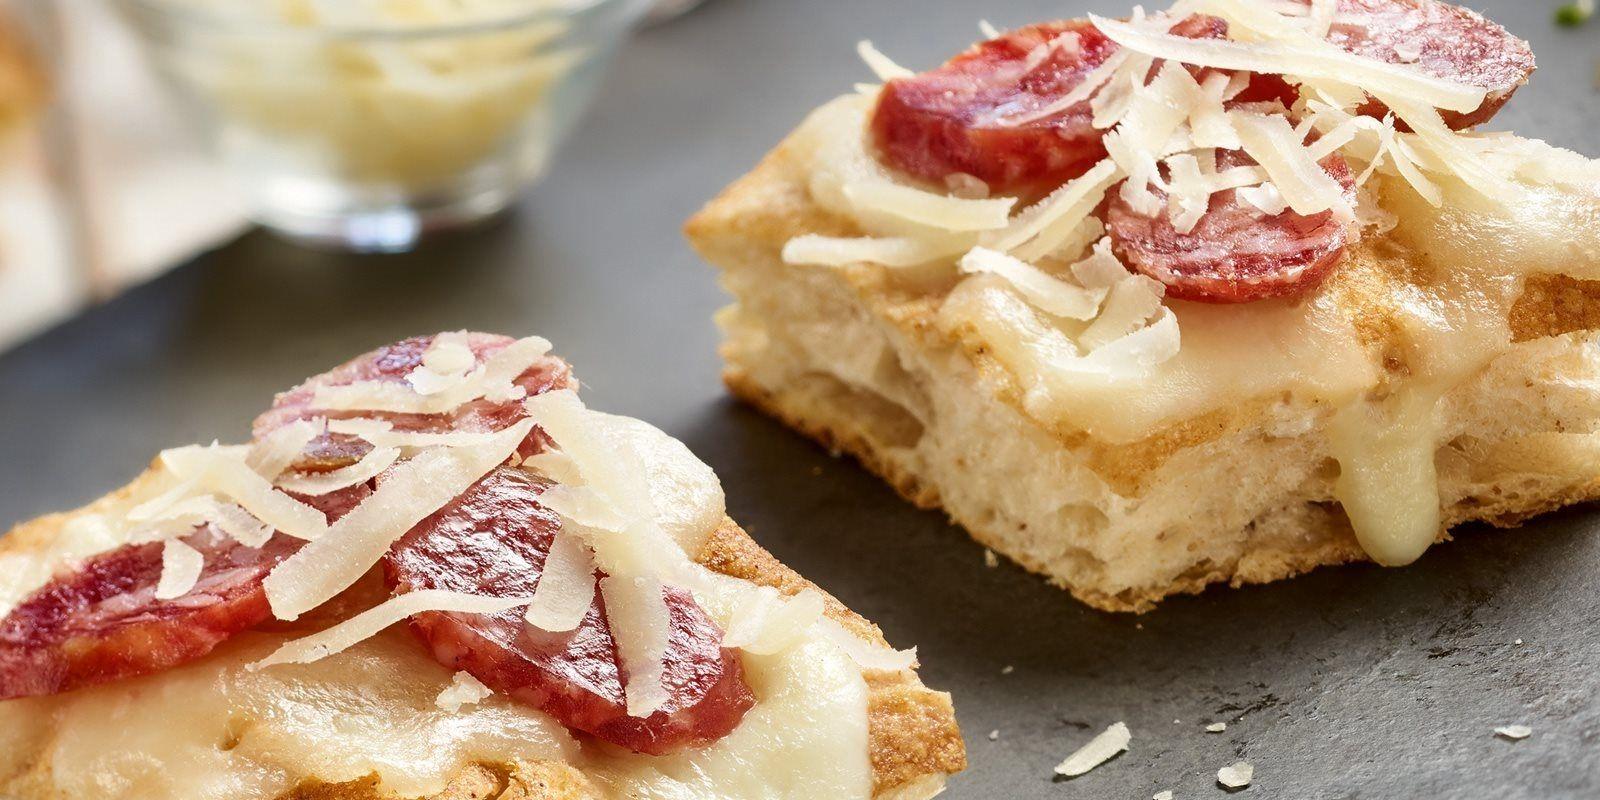 levoni_emozionale_ricette_panino_salame-romagnola